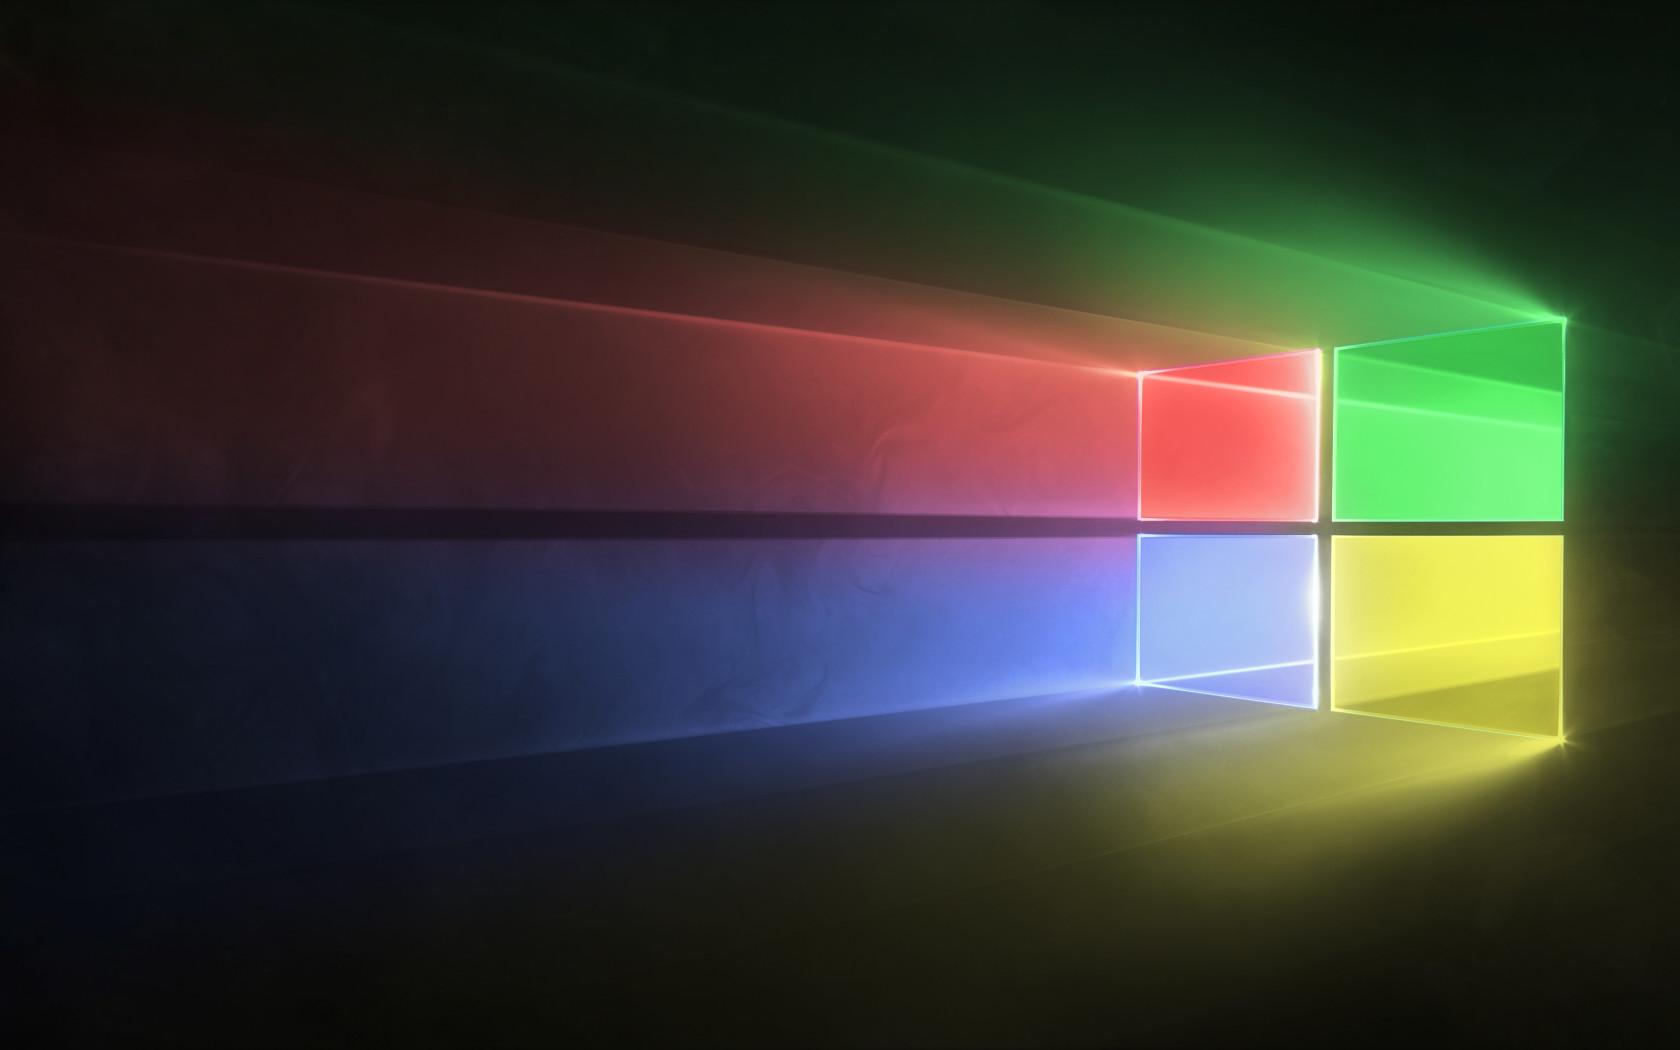 Windows 10 Wallpaper Colored , HD Wallpaper & Backgrounds